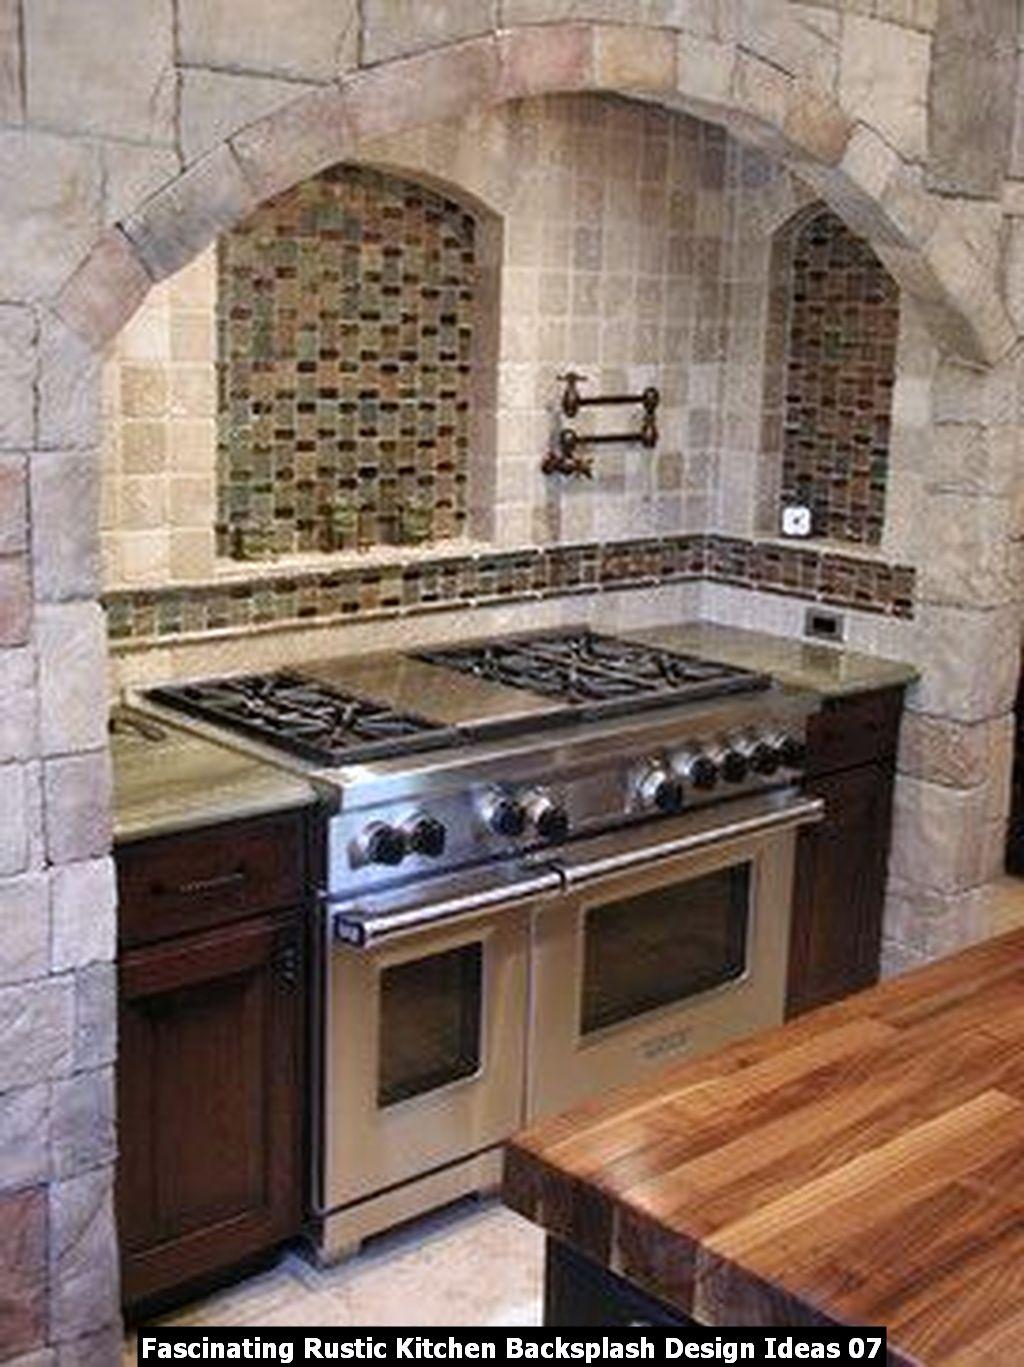 Fascinating Rustic Kitchen Backsplash Design Ideas 07